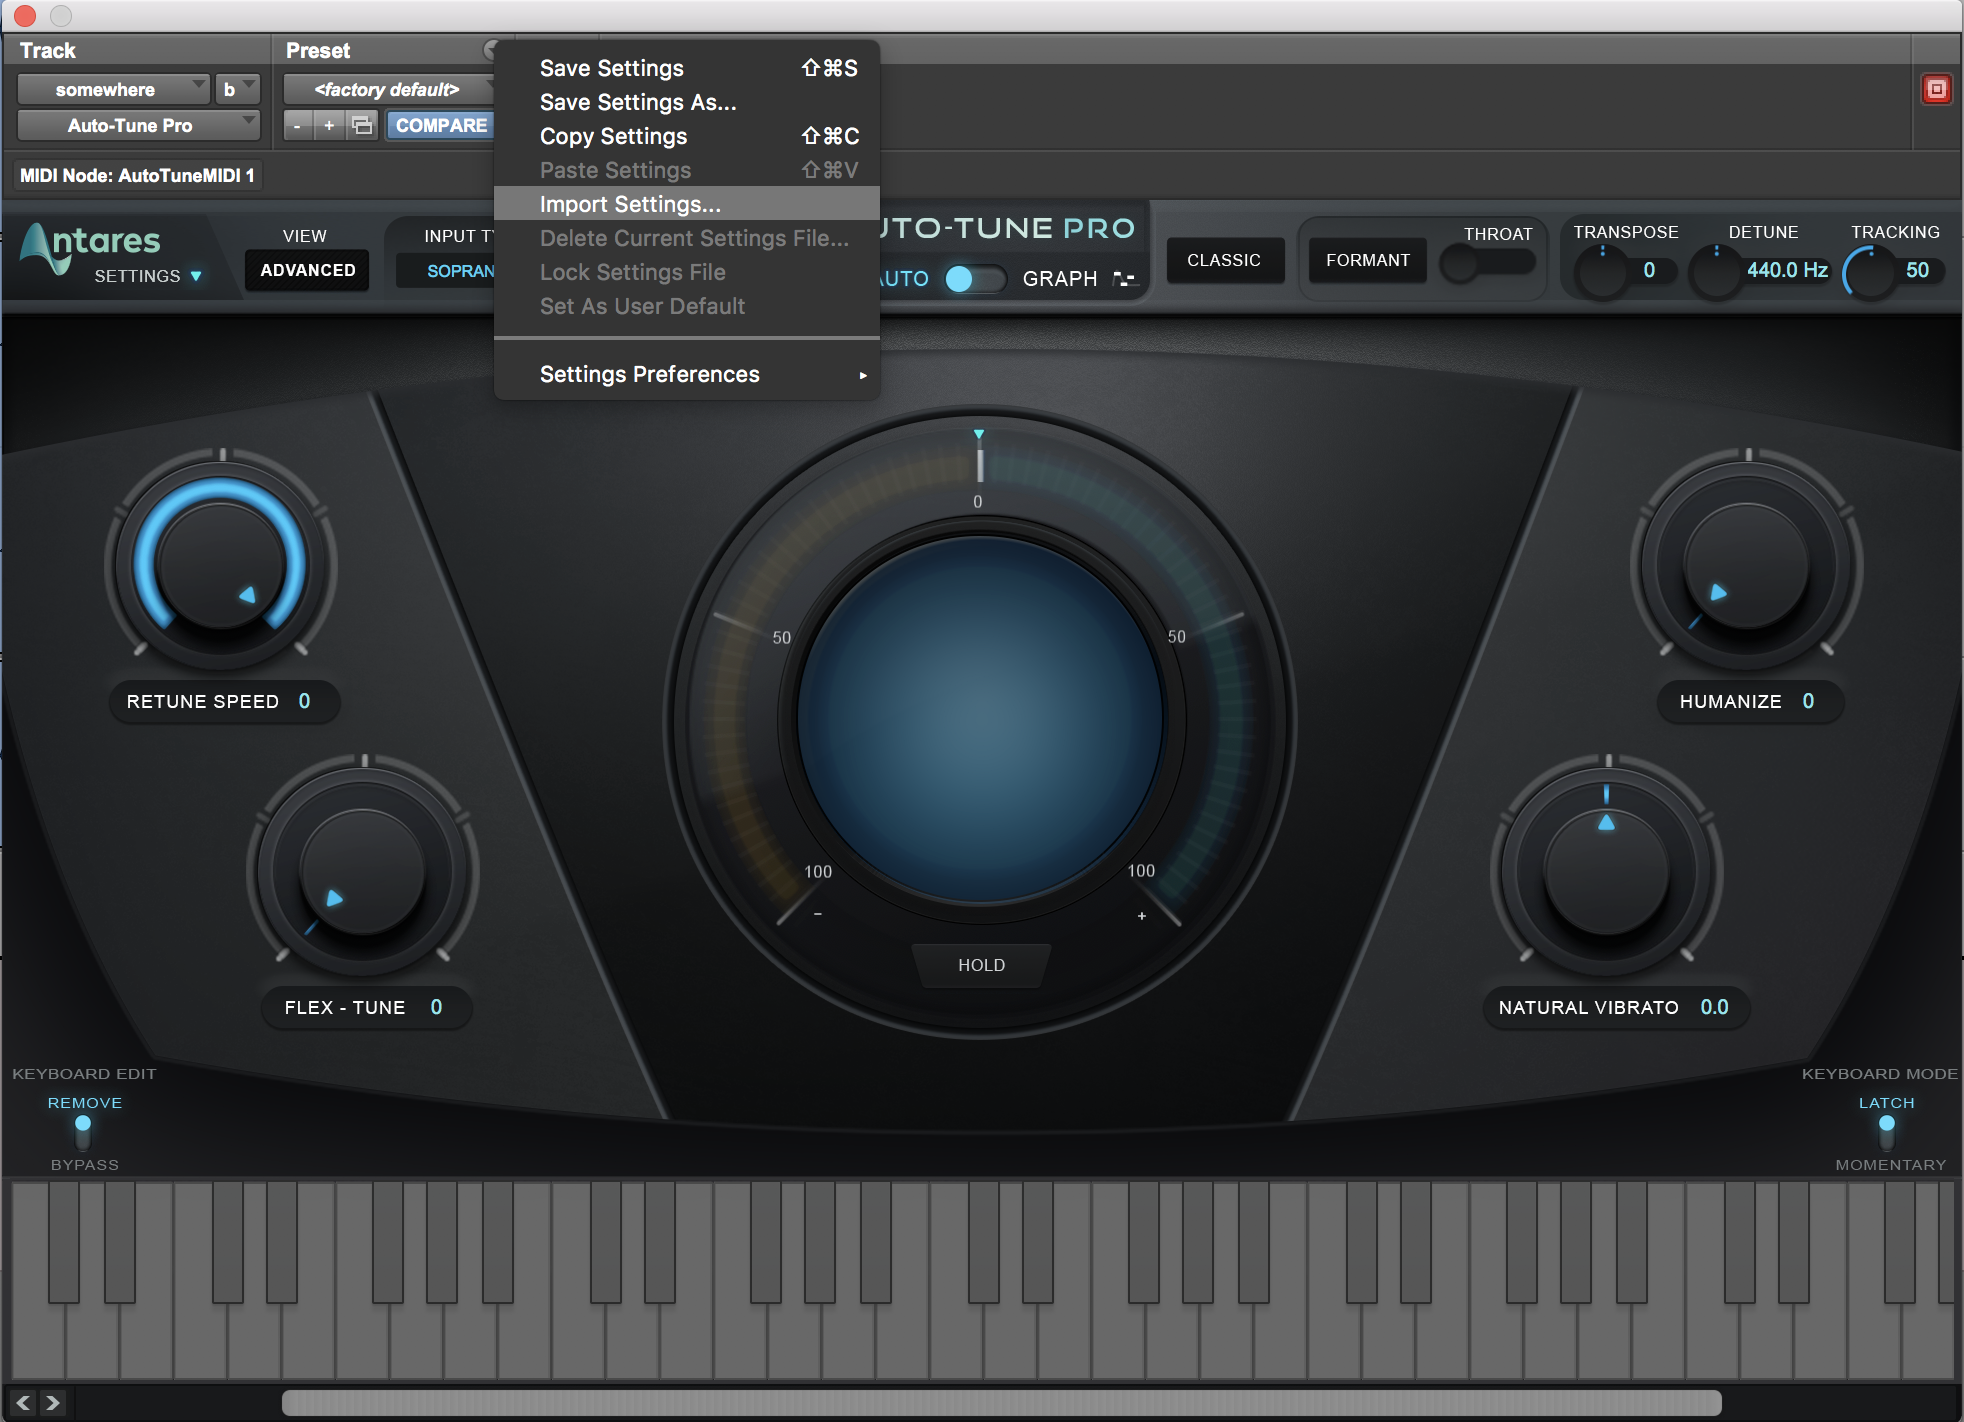 Importing an Auto-Tune 8 1 AAX preset in to Auto-Tune Pro